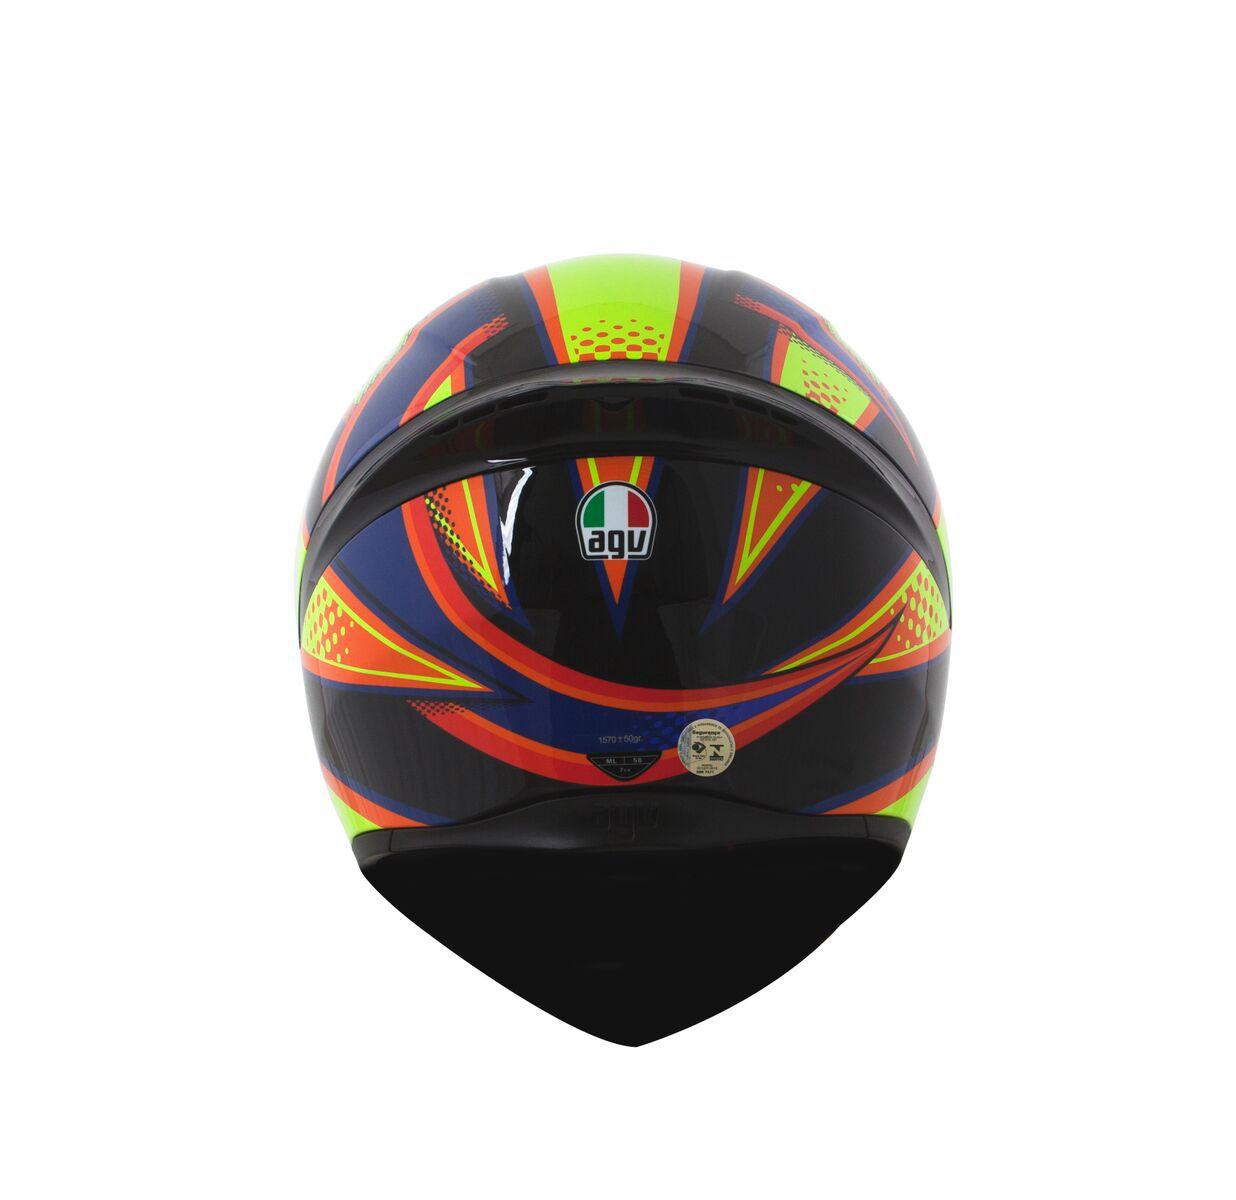 Capacete AGV K1 Soleluna 15 PretoAmarelo (Valentino Rossi)